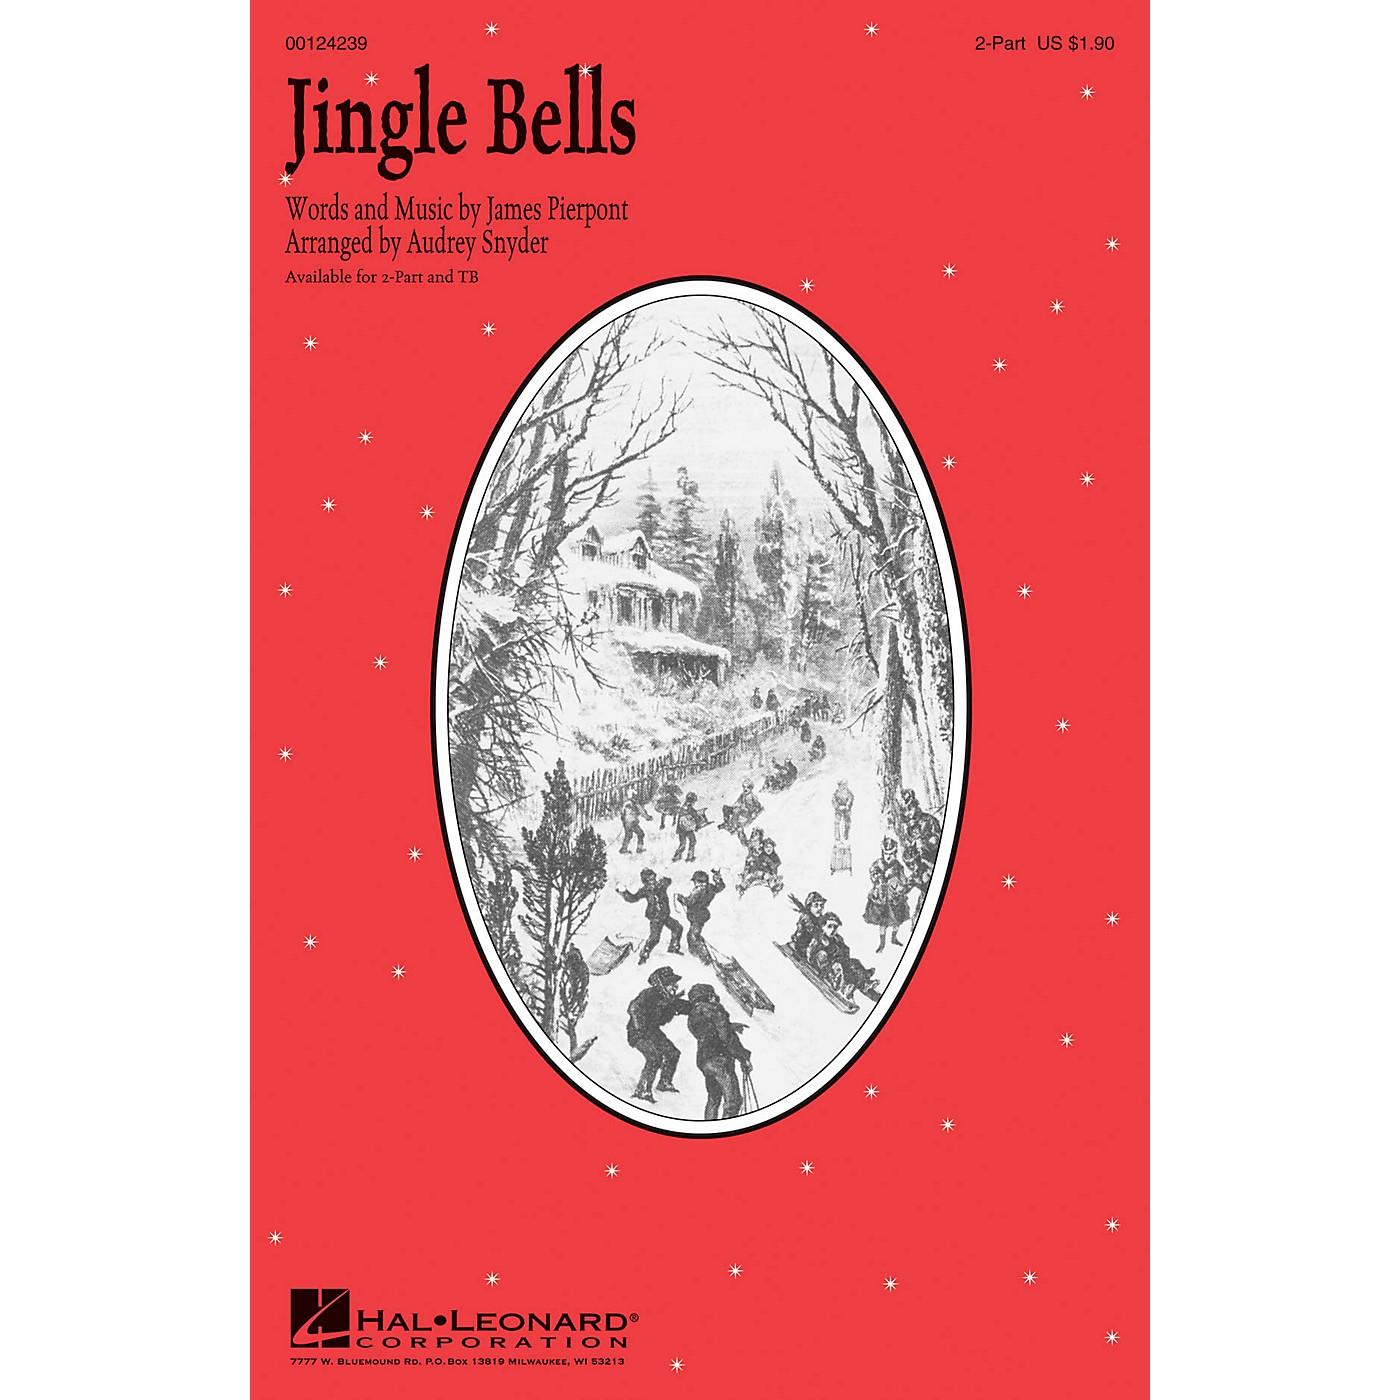 Hal Leonard Jingle Bells 2-Part arranged by Audrey Snyder thumbnail